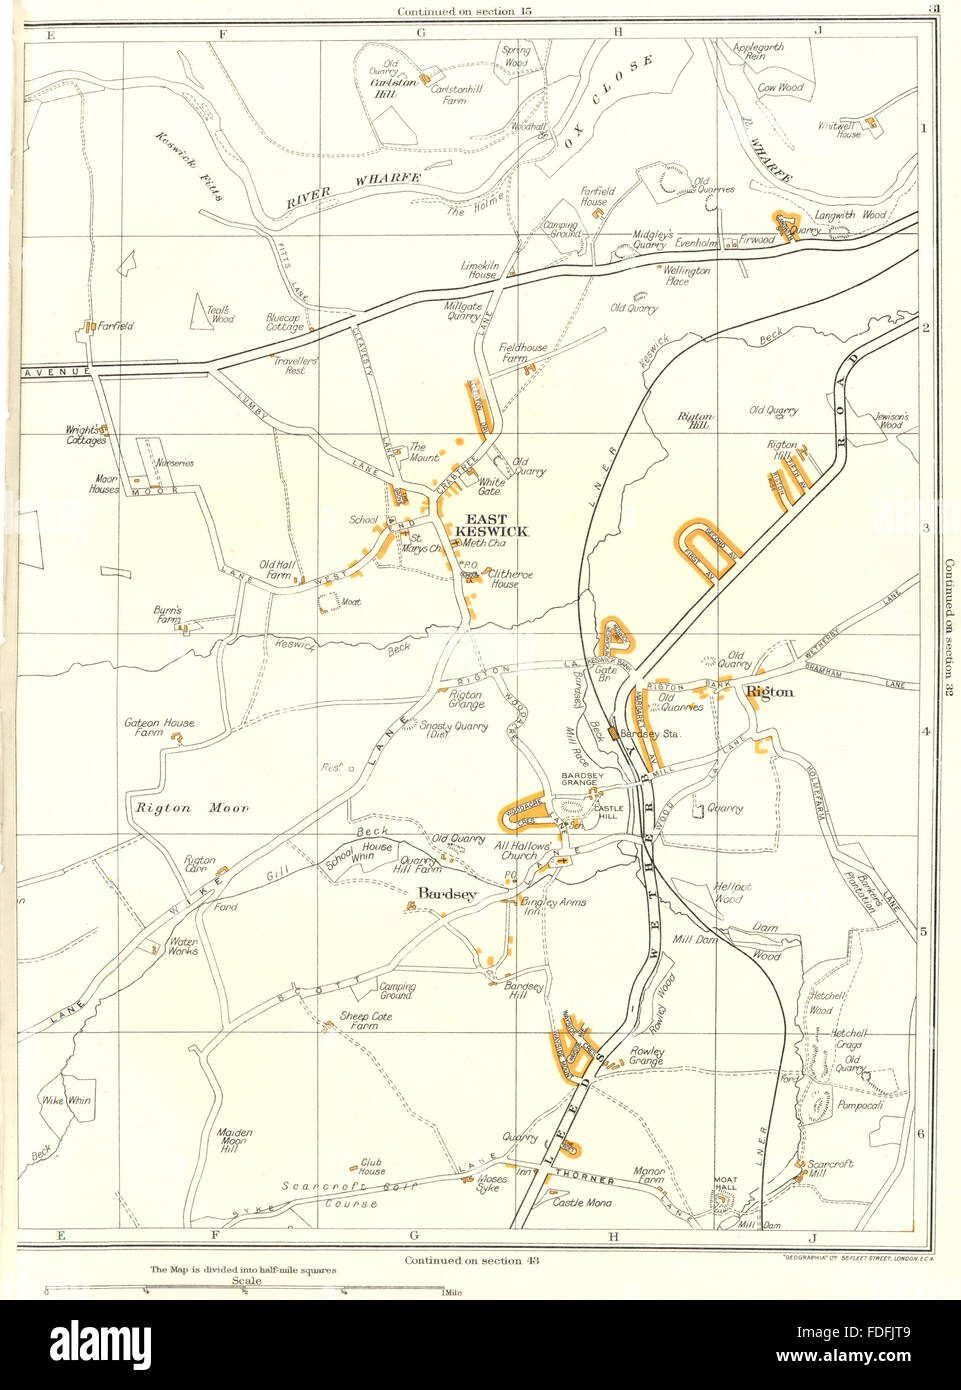 YORKS.West Church East Moor Garforth,Barrowby,Parlington Hollins 1935 old map